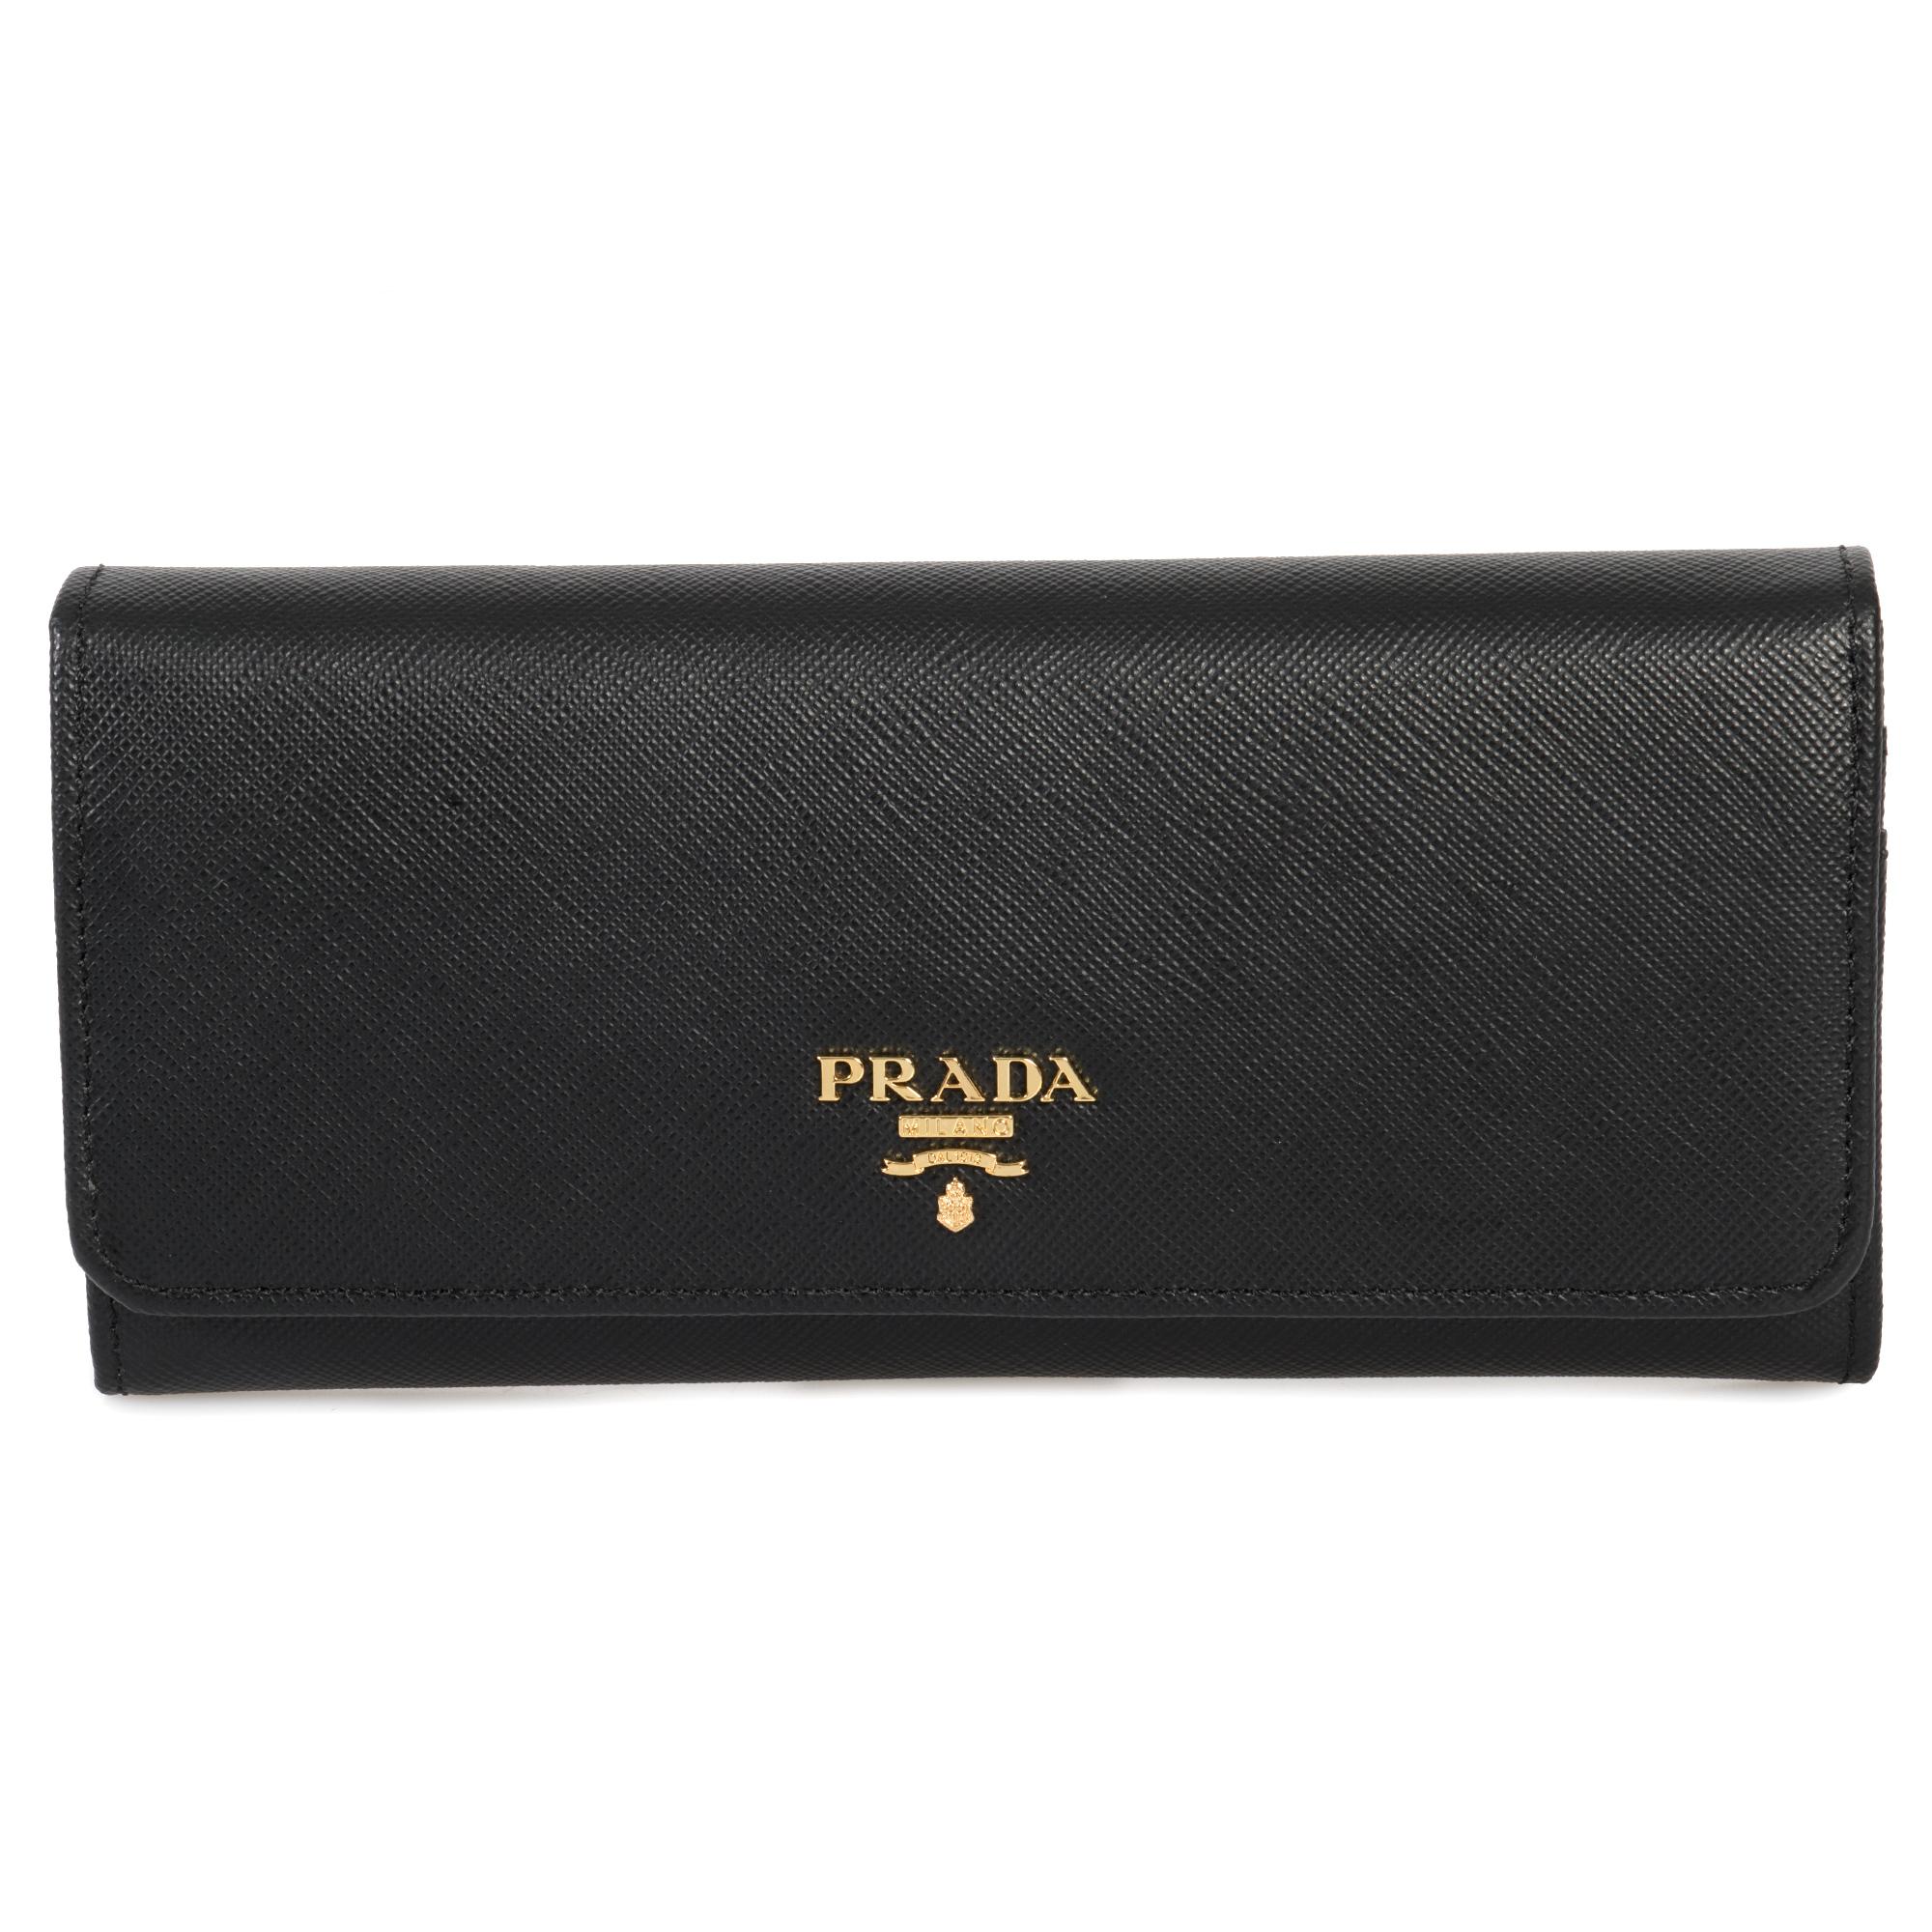 5d215492 Details about Prada Black Saffiano Leather Flap Wallet 1MH132 QWA F0002